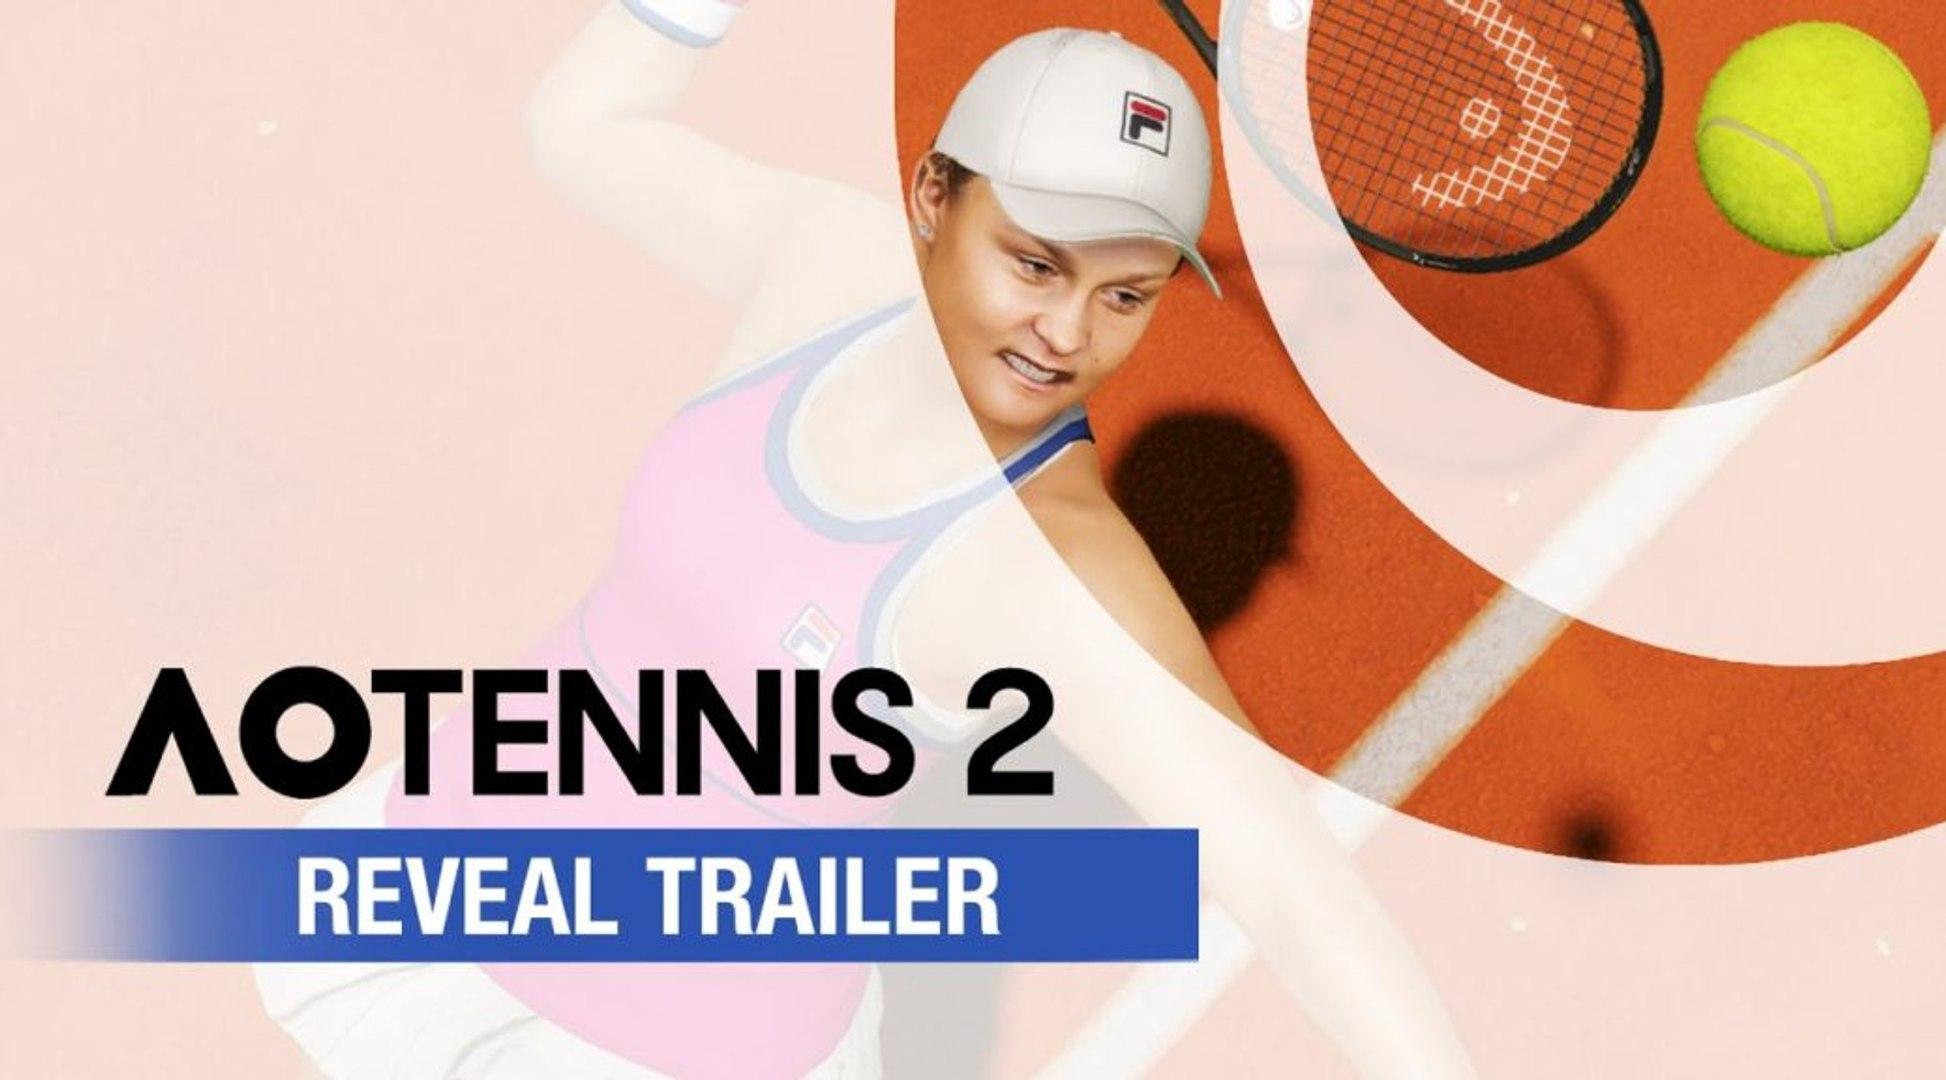 AO Tennis 2 - Reveal Trailer | Official Tennis Game 2020